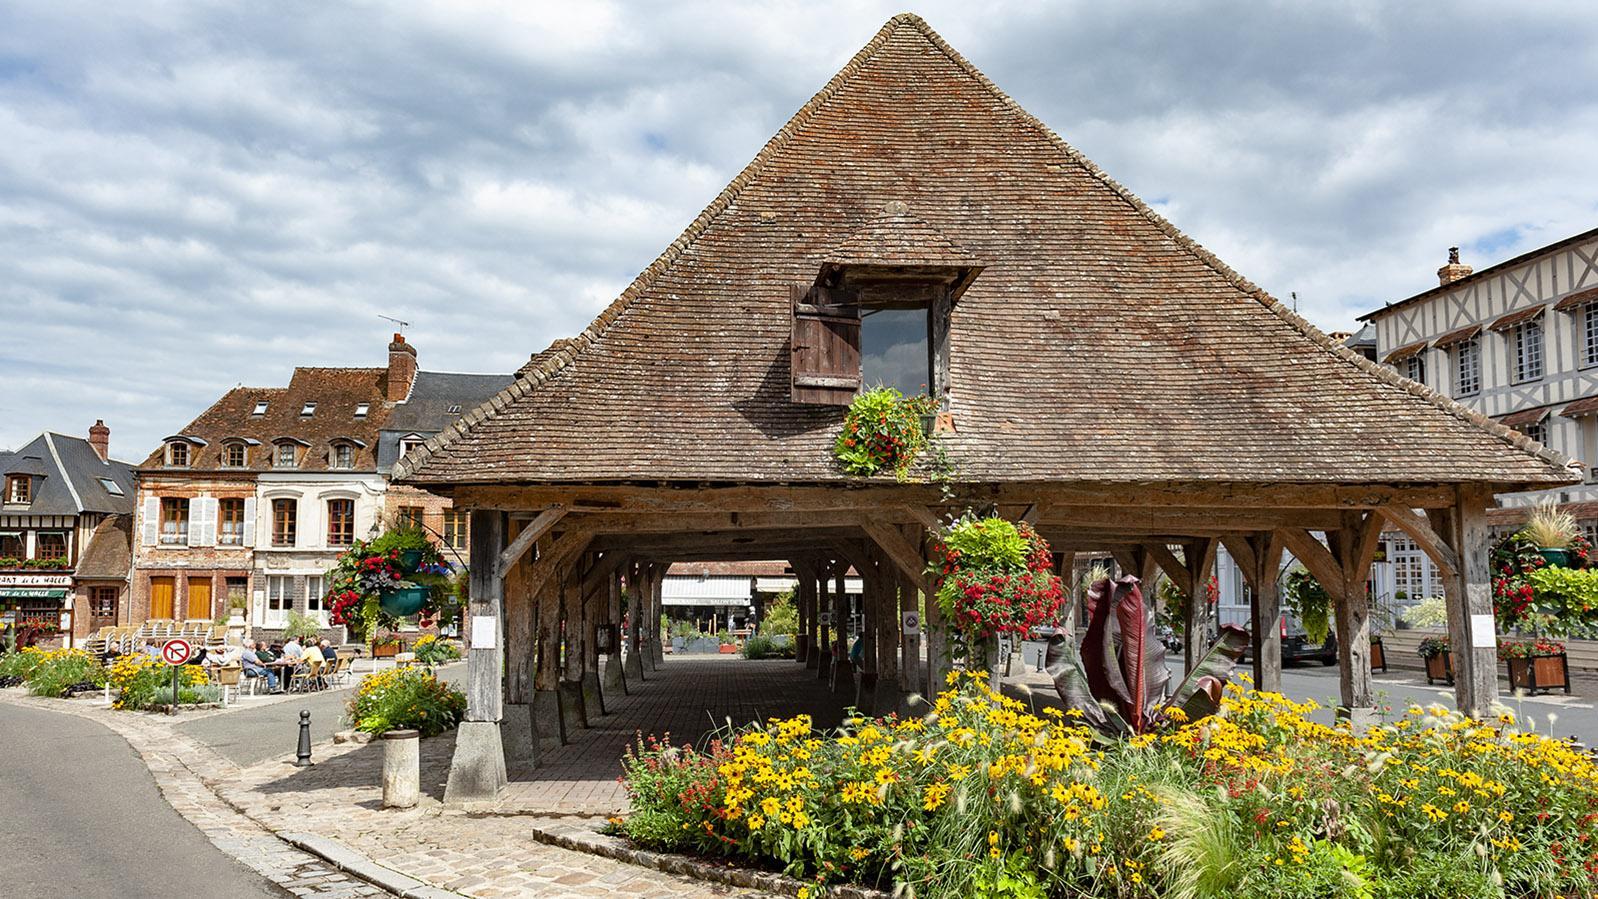 Pays de Caux: die Markthalle von Lyons-la-Forêt. Foto: Hilke Maunder